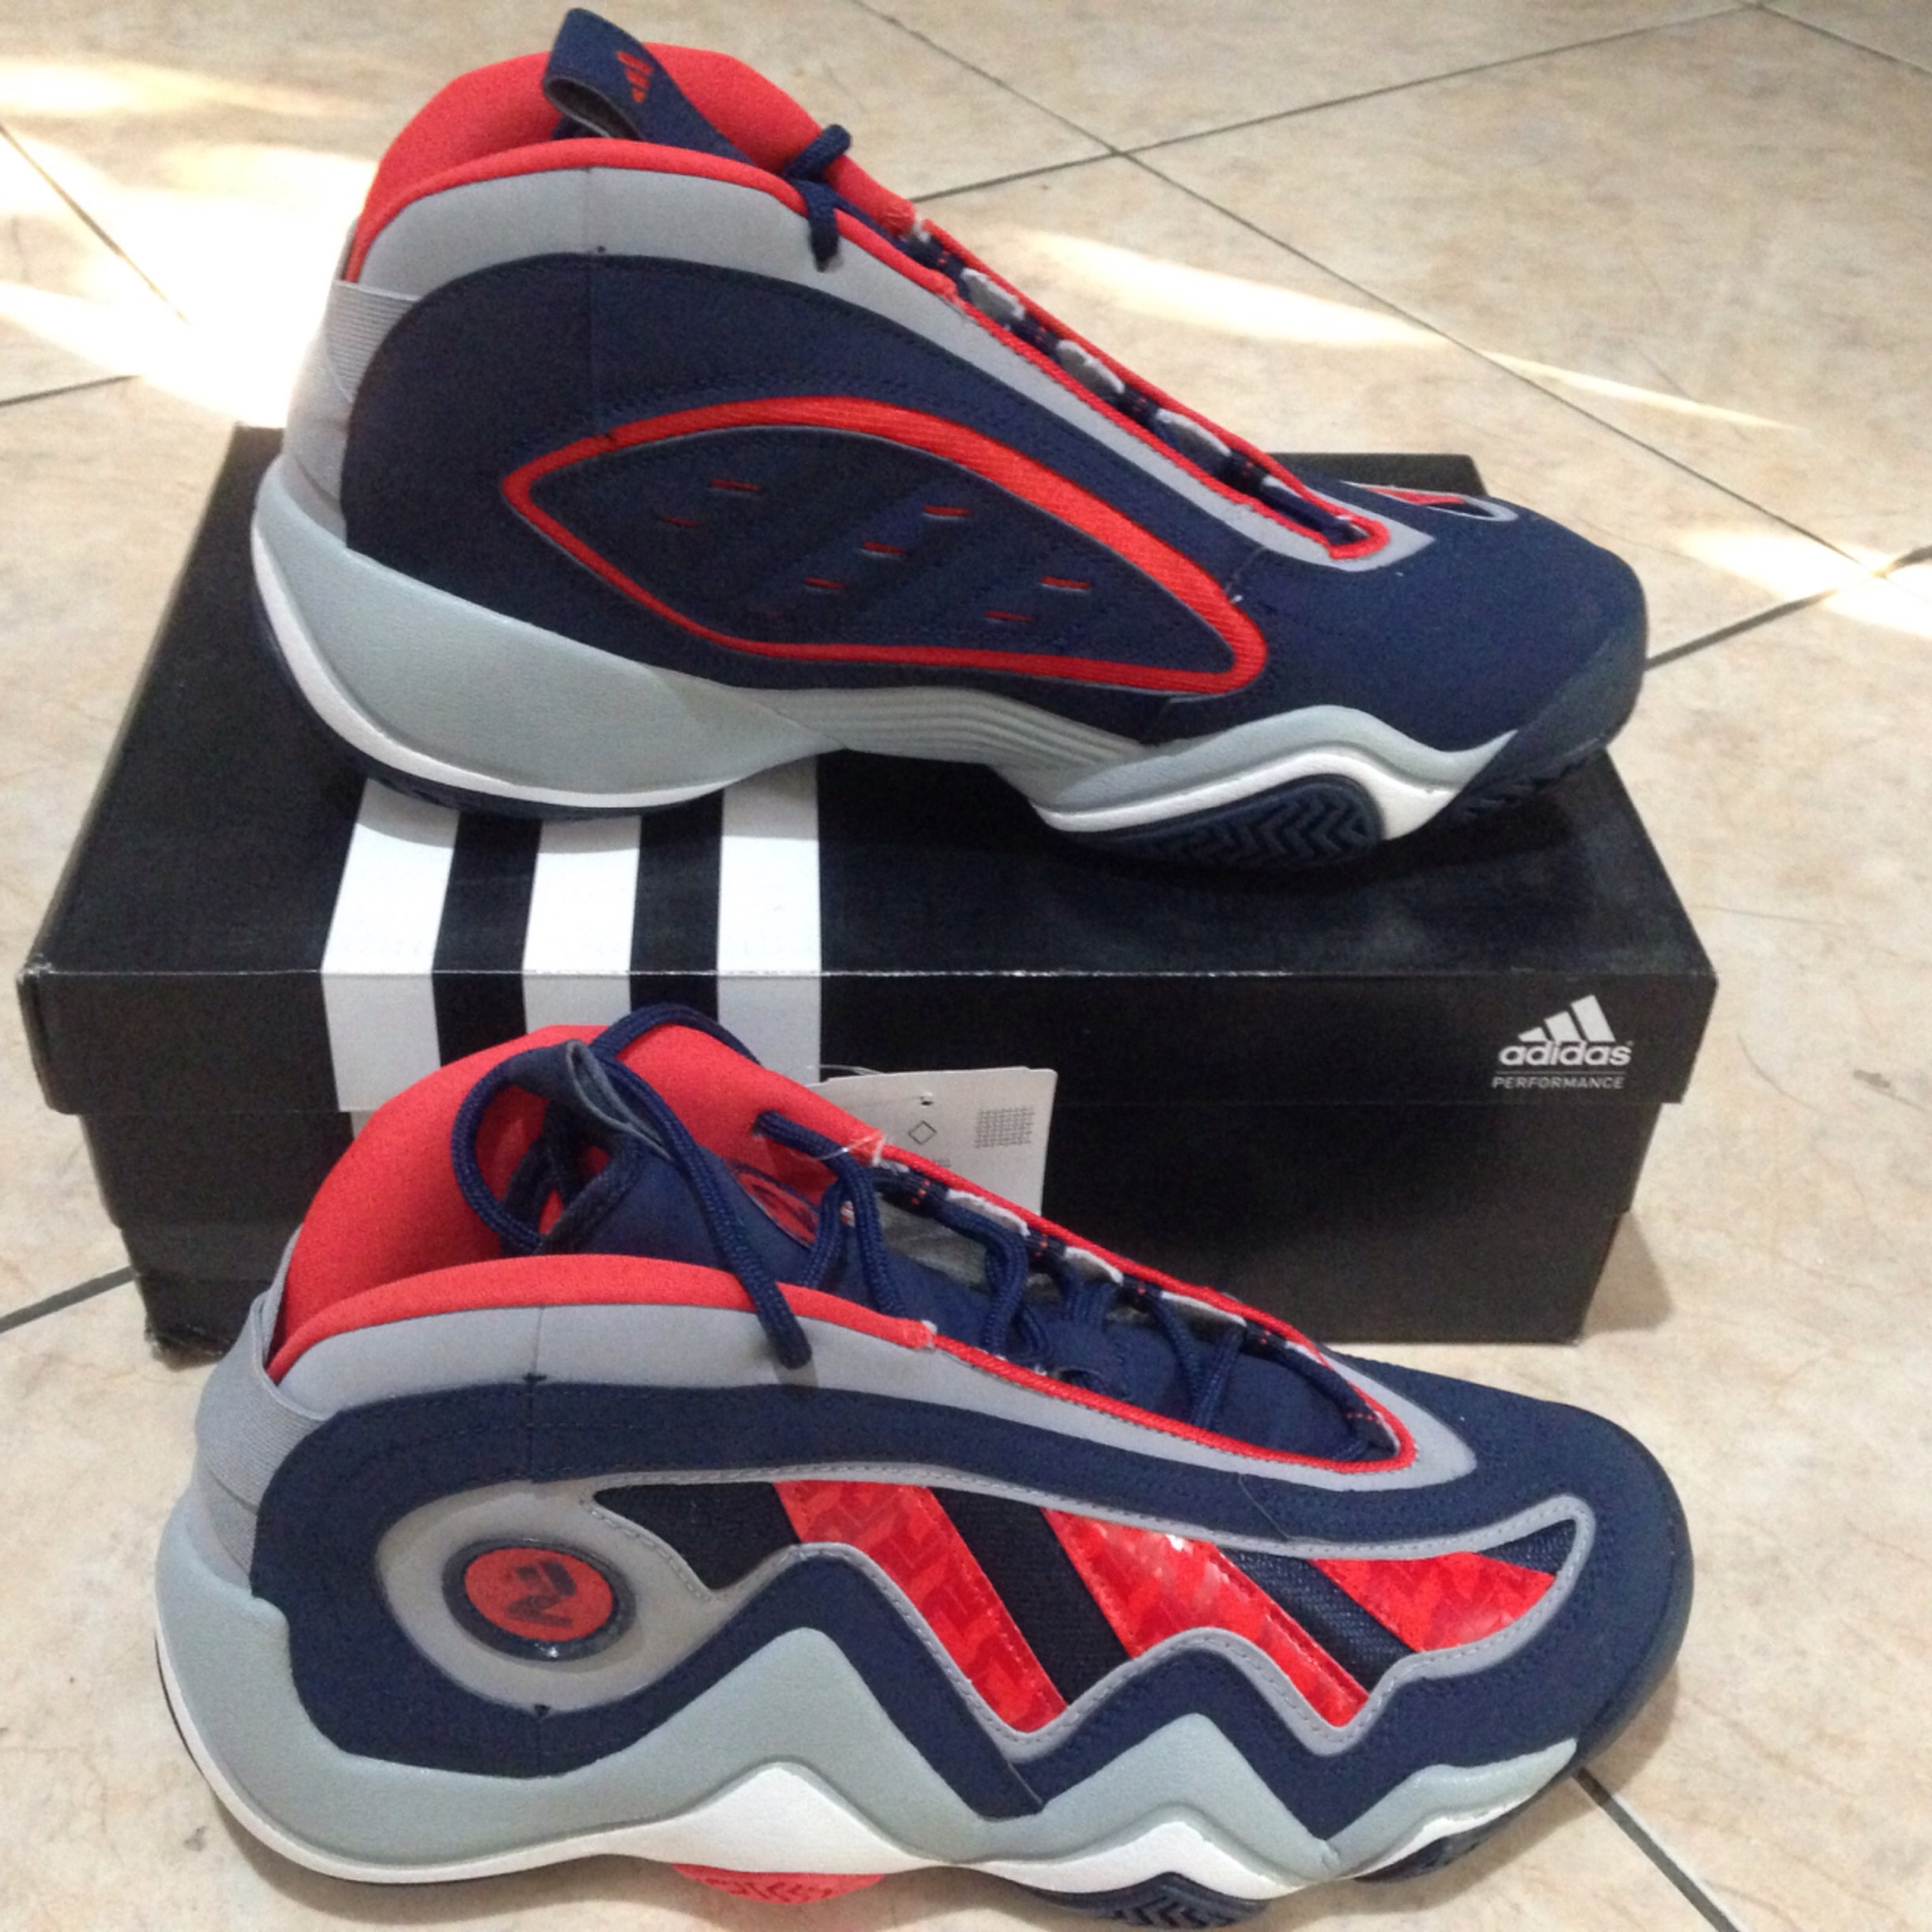 Jual Adidas Crazy 97 John Wall Size 46. Sepatu Basket - Sportsite ... 5badcfa48e